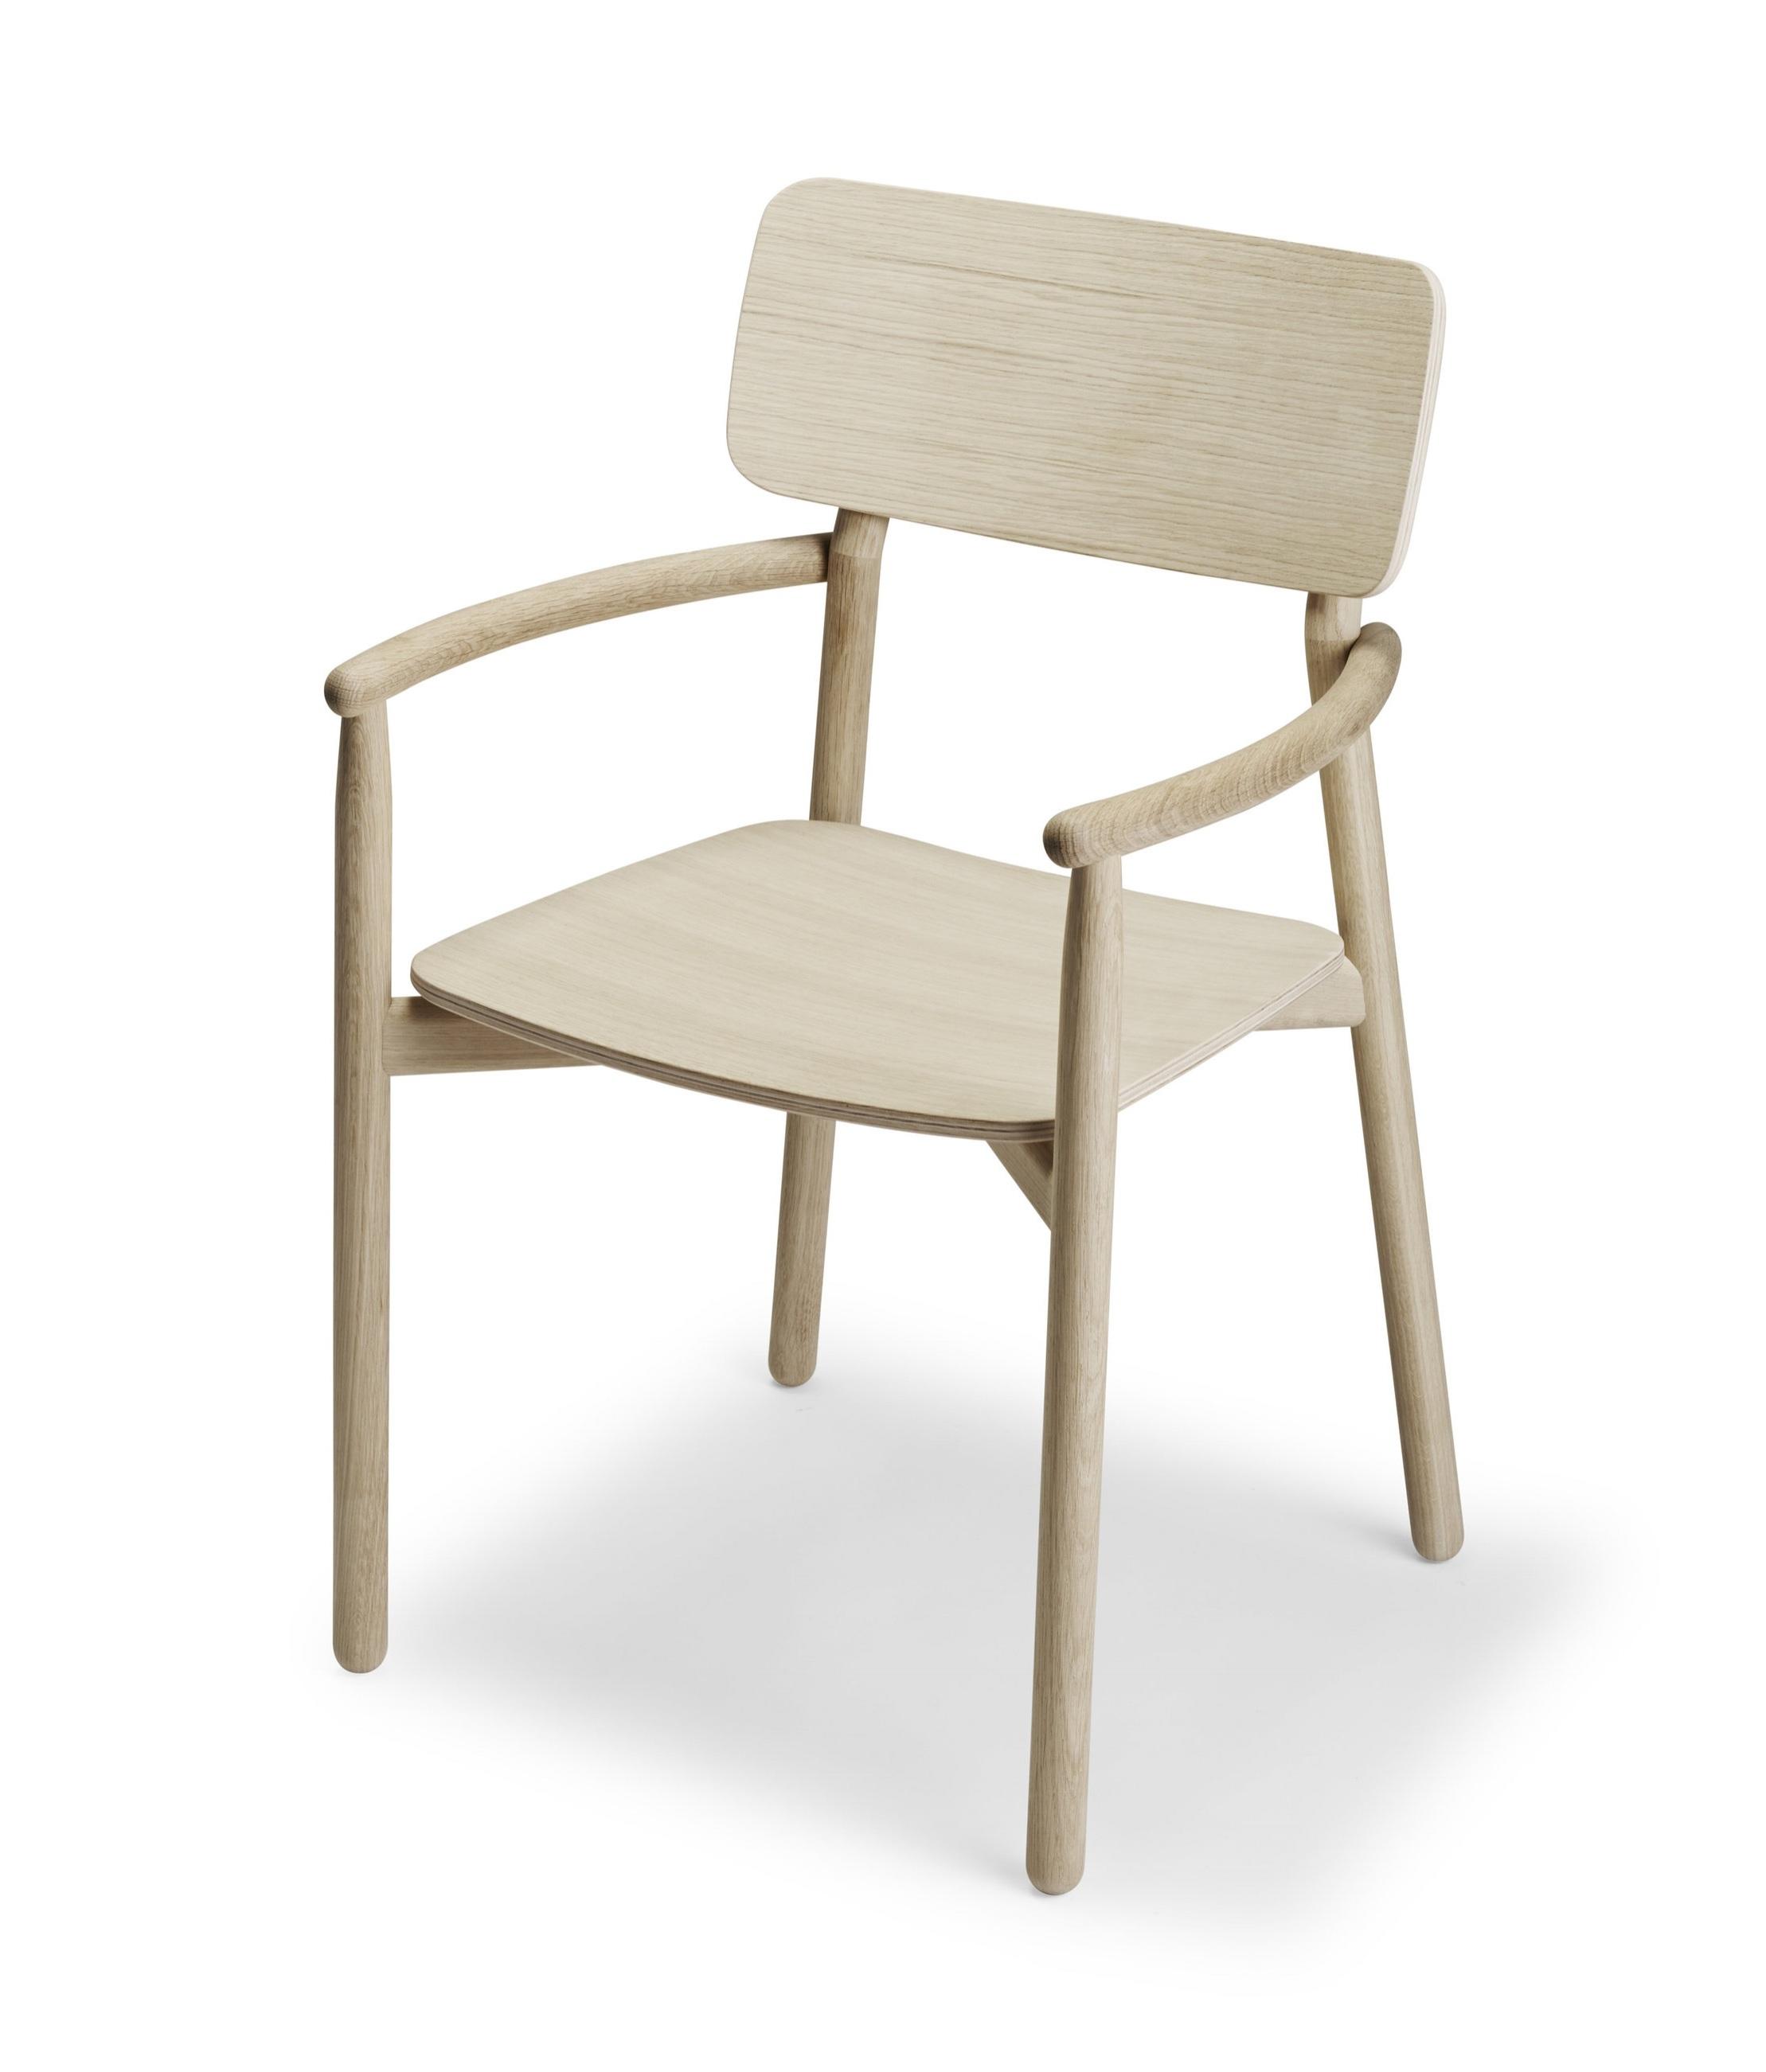 2017 - HVEN, armchair / Skagerak